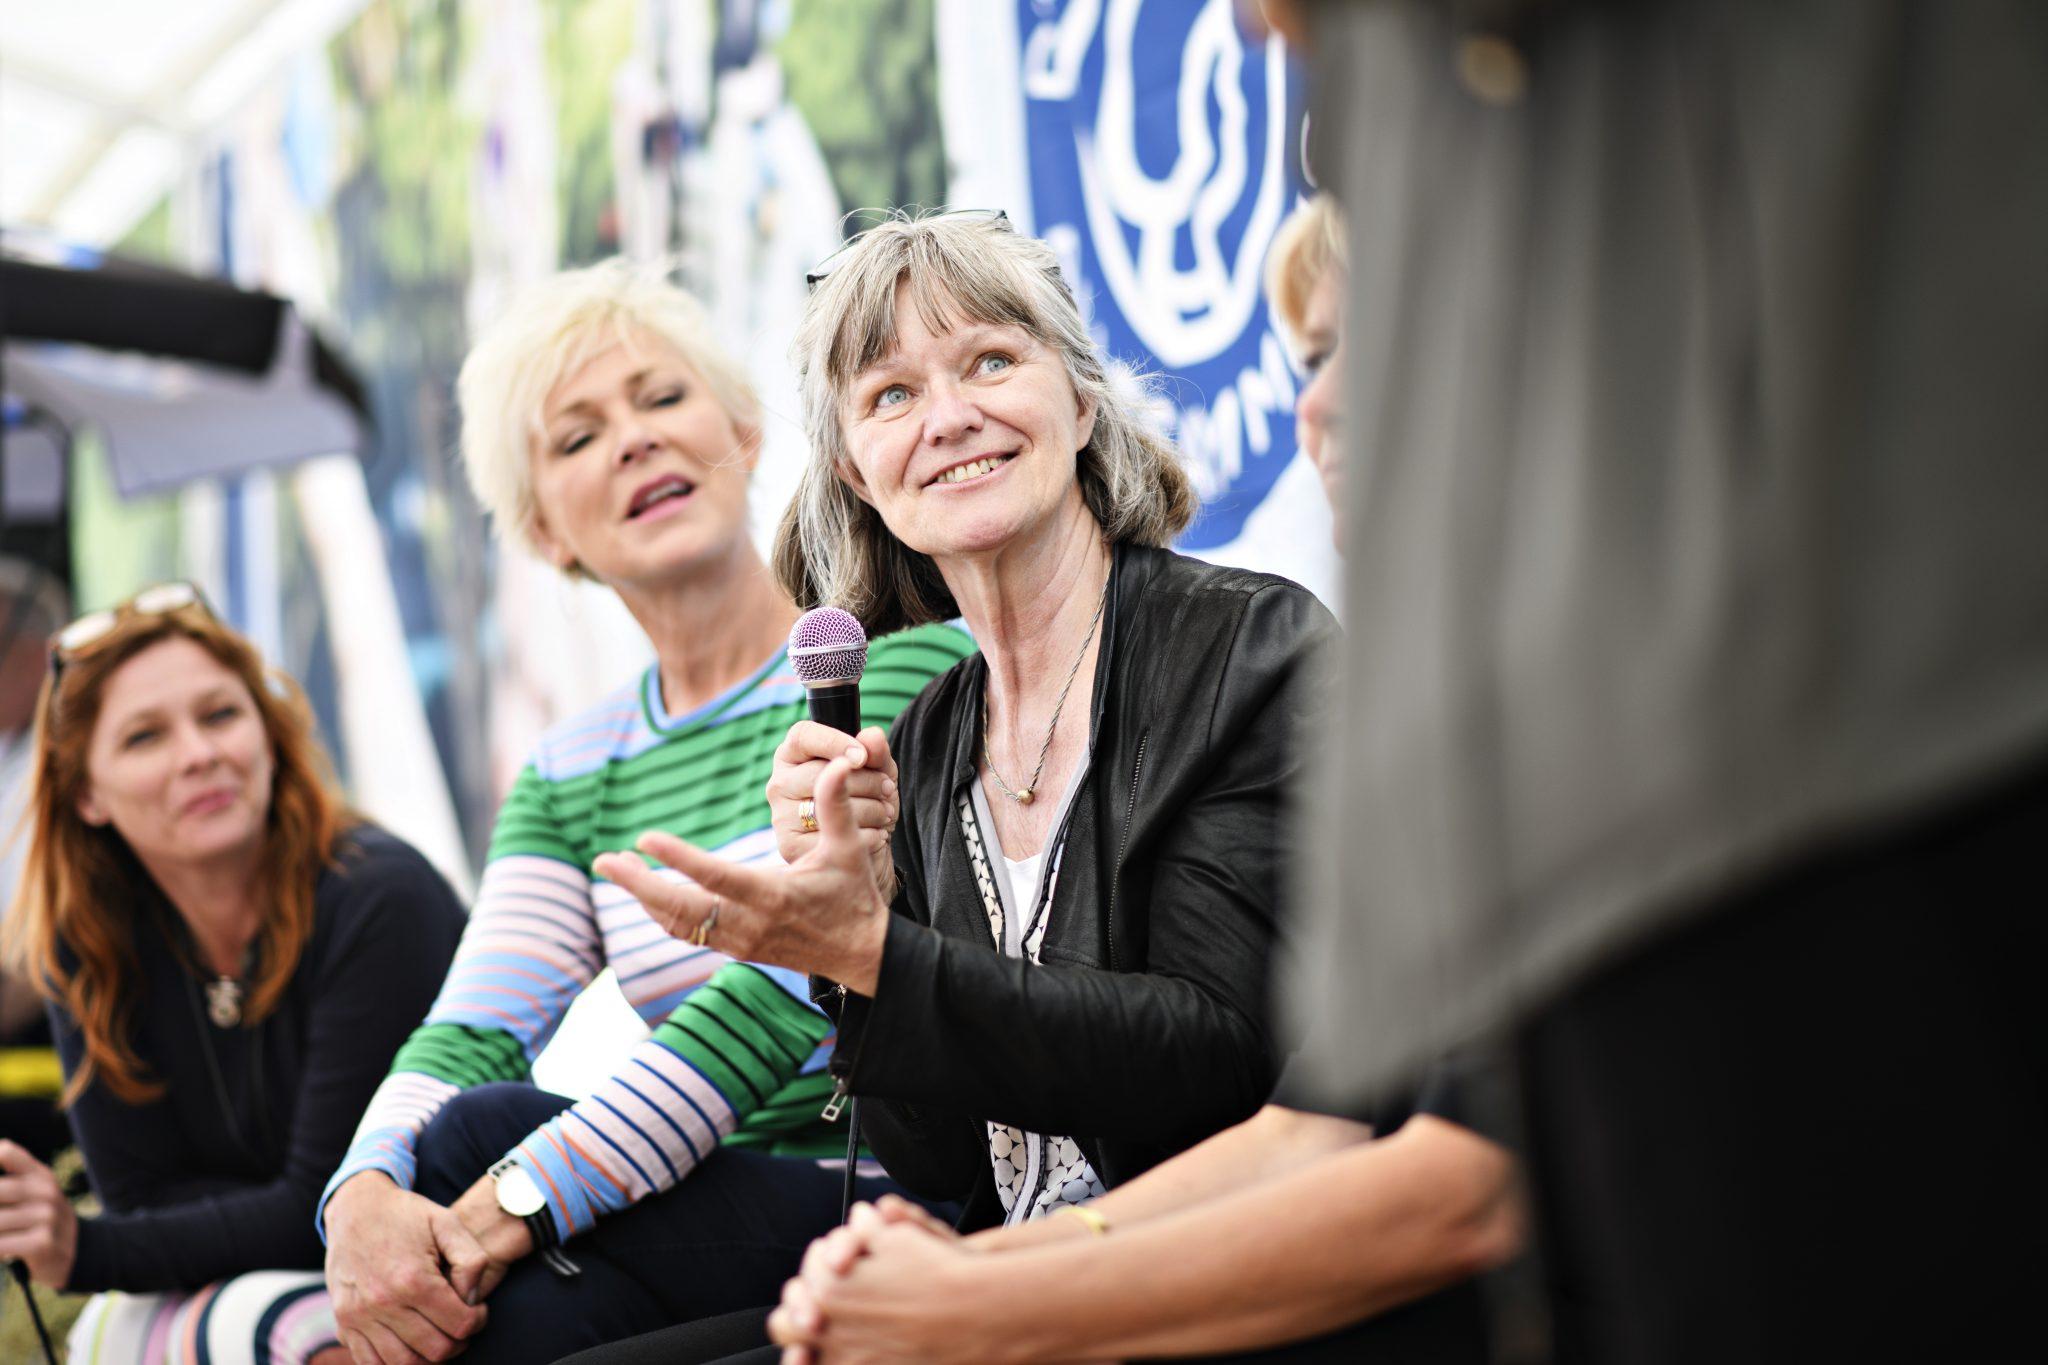 Forenet Kredit på Folkemødet 2018 på Bornholm. Foto: Philip Davali